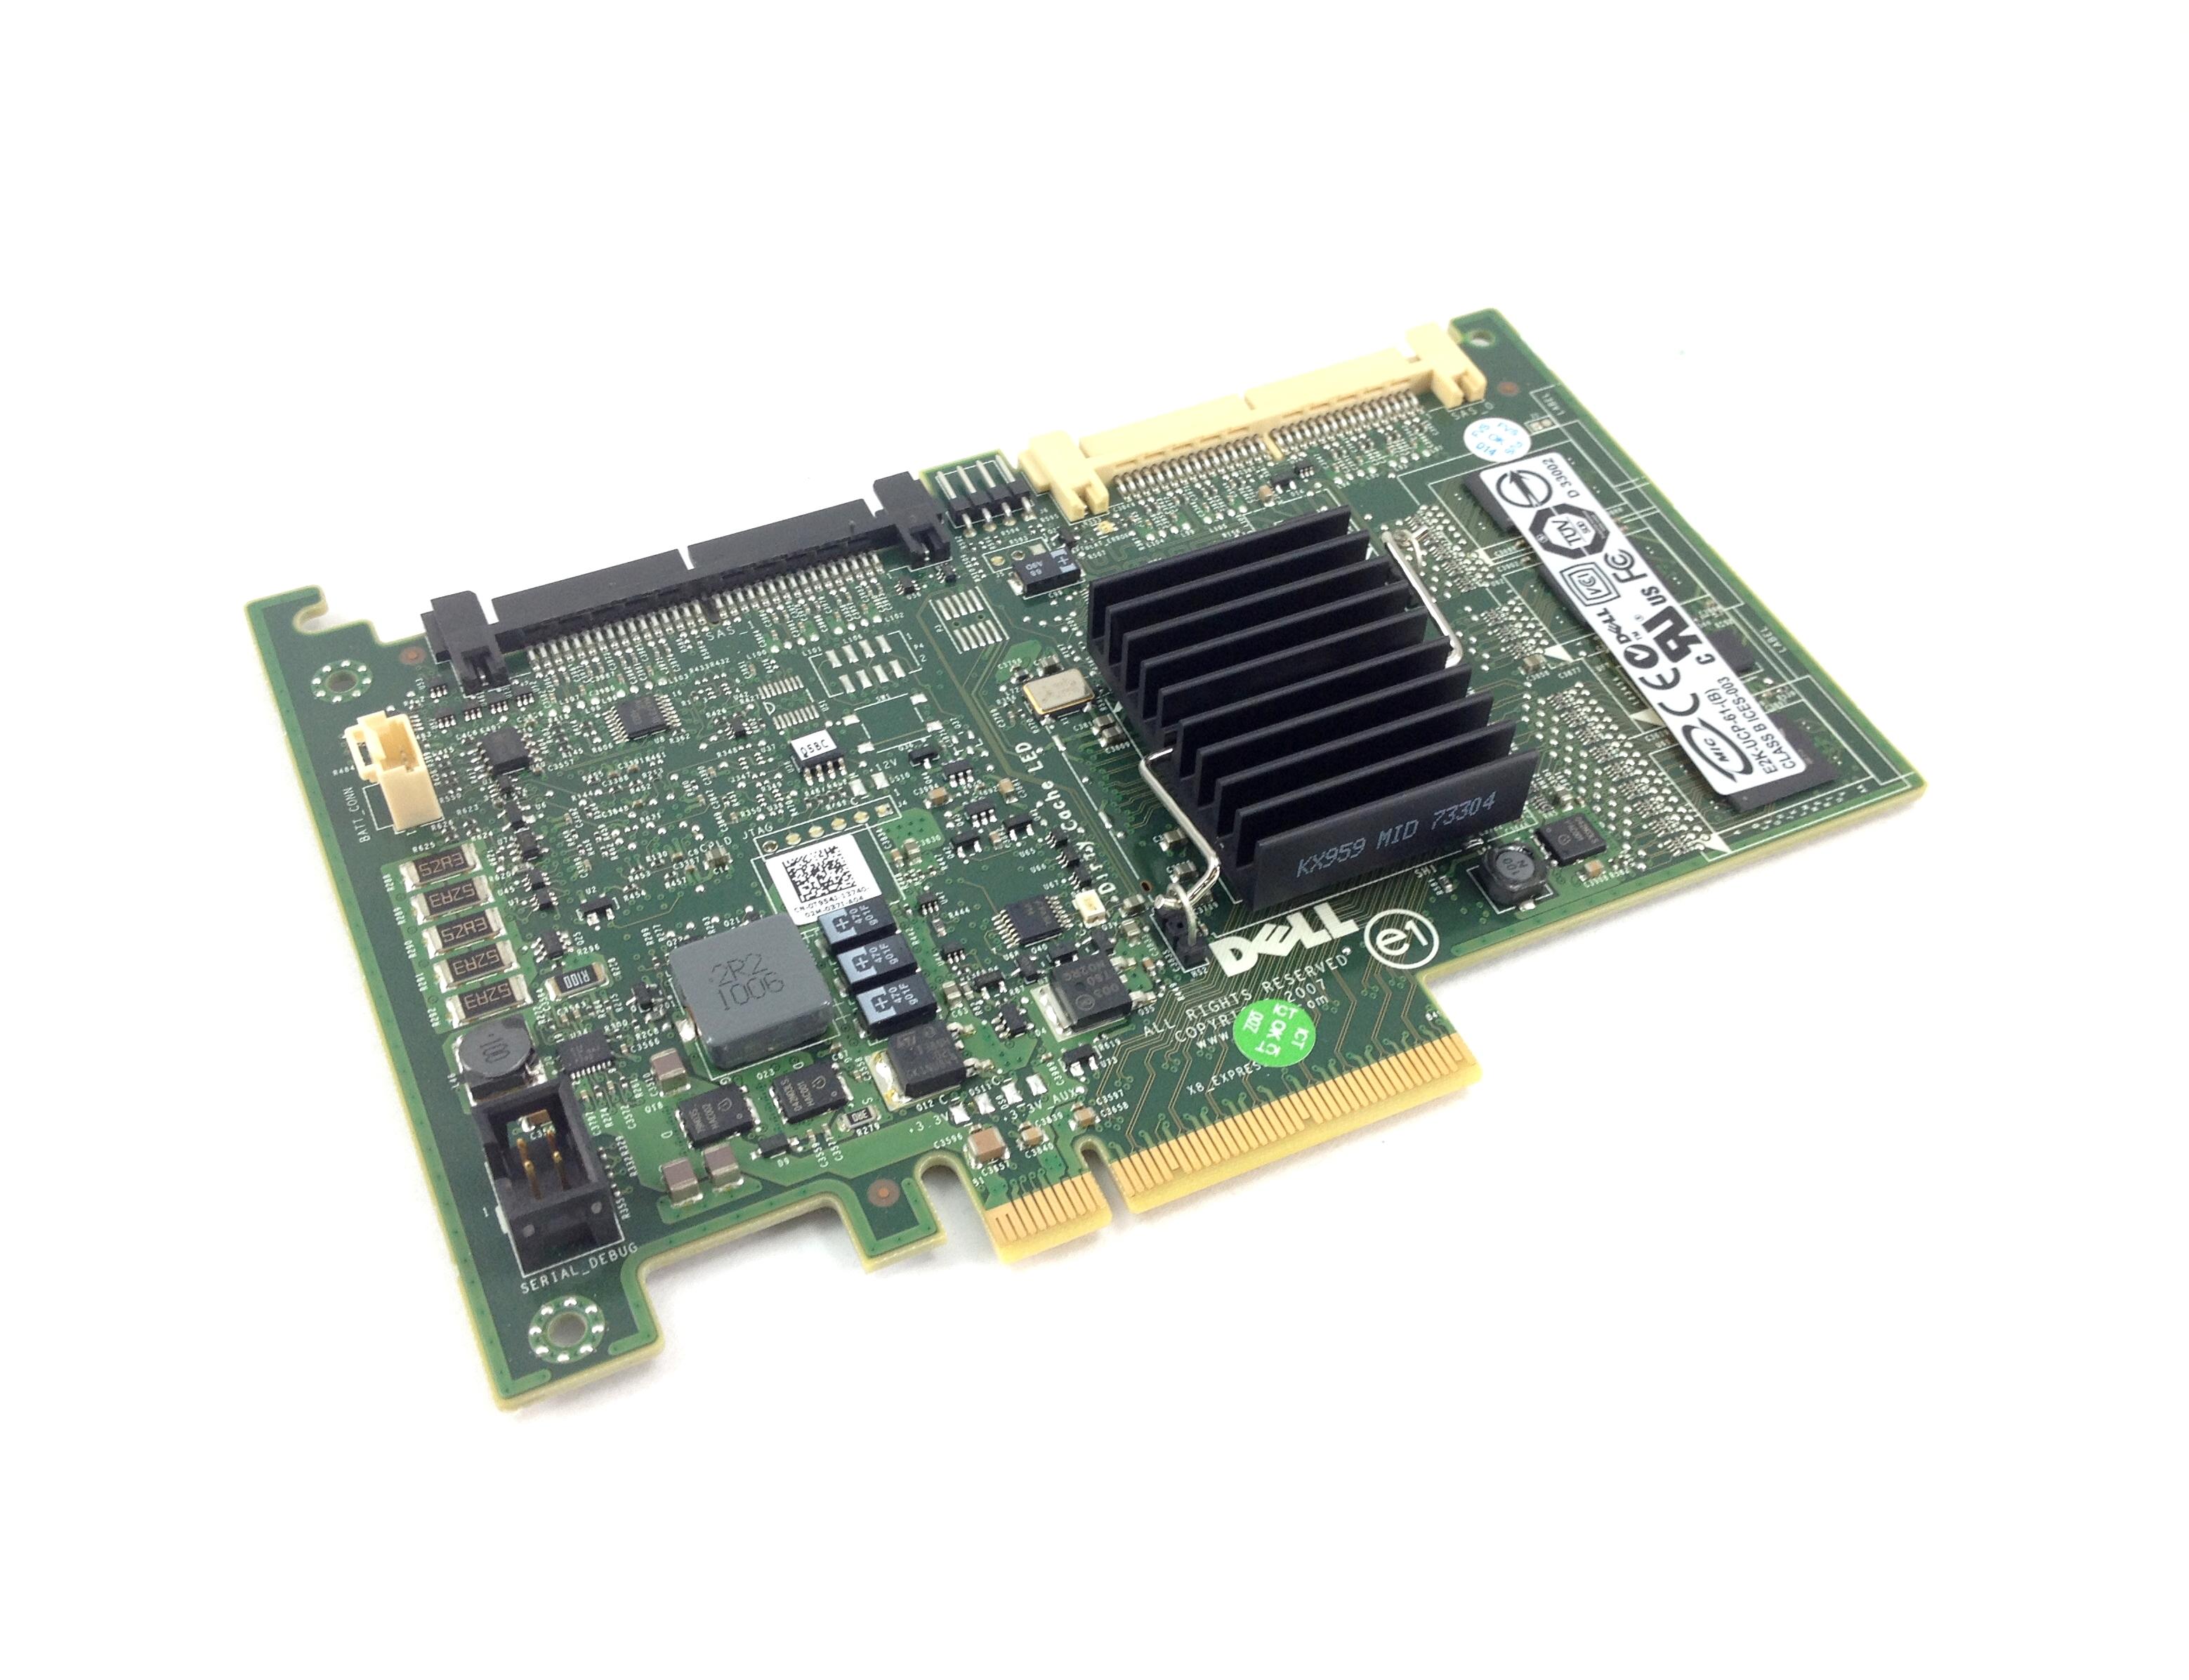 DELL POWERERDGE PERC 6/I PCI-E SAS/SATA RAID CONTROLLER (T954J)